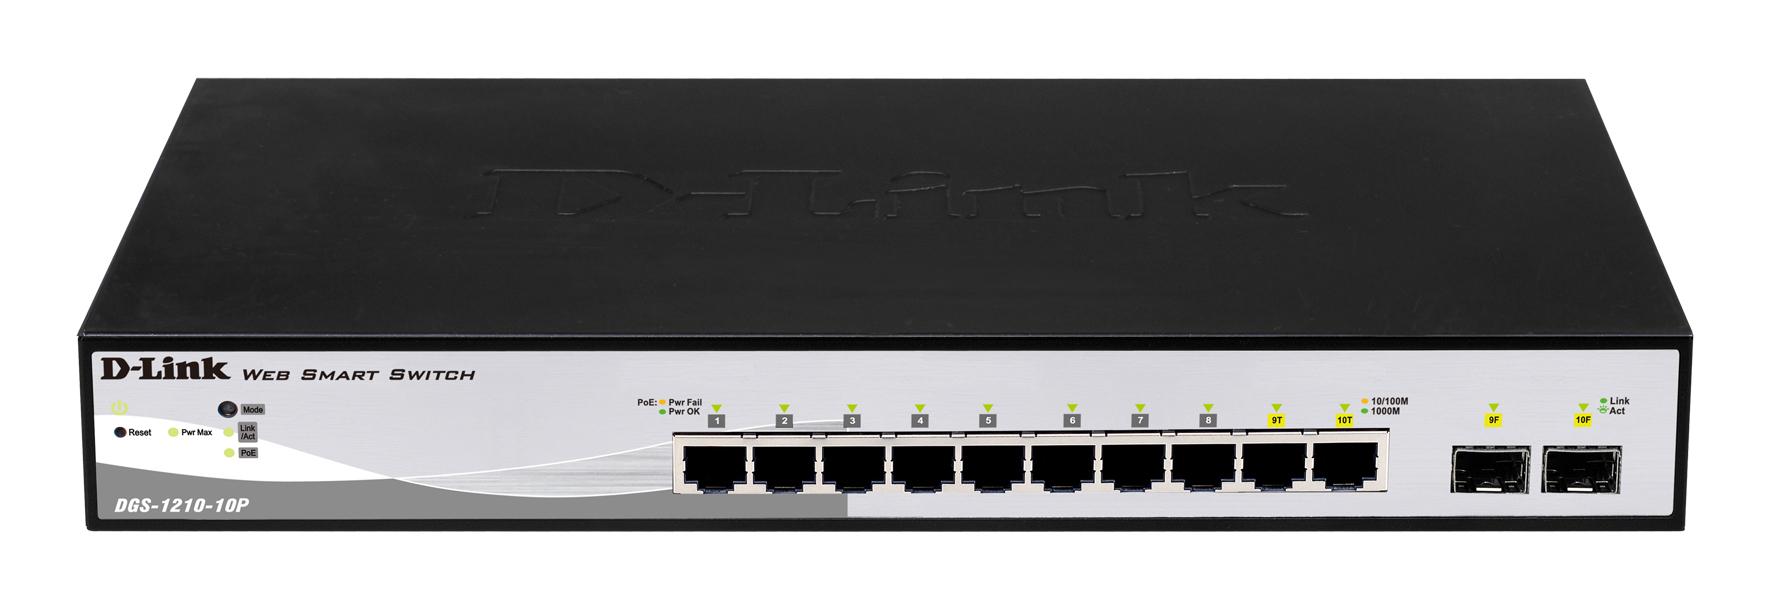 D-Link DGS-1210-10P network switch